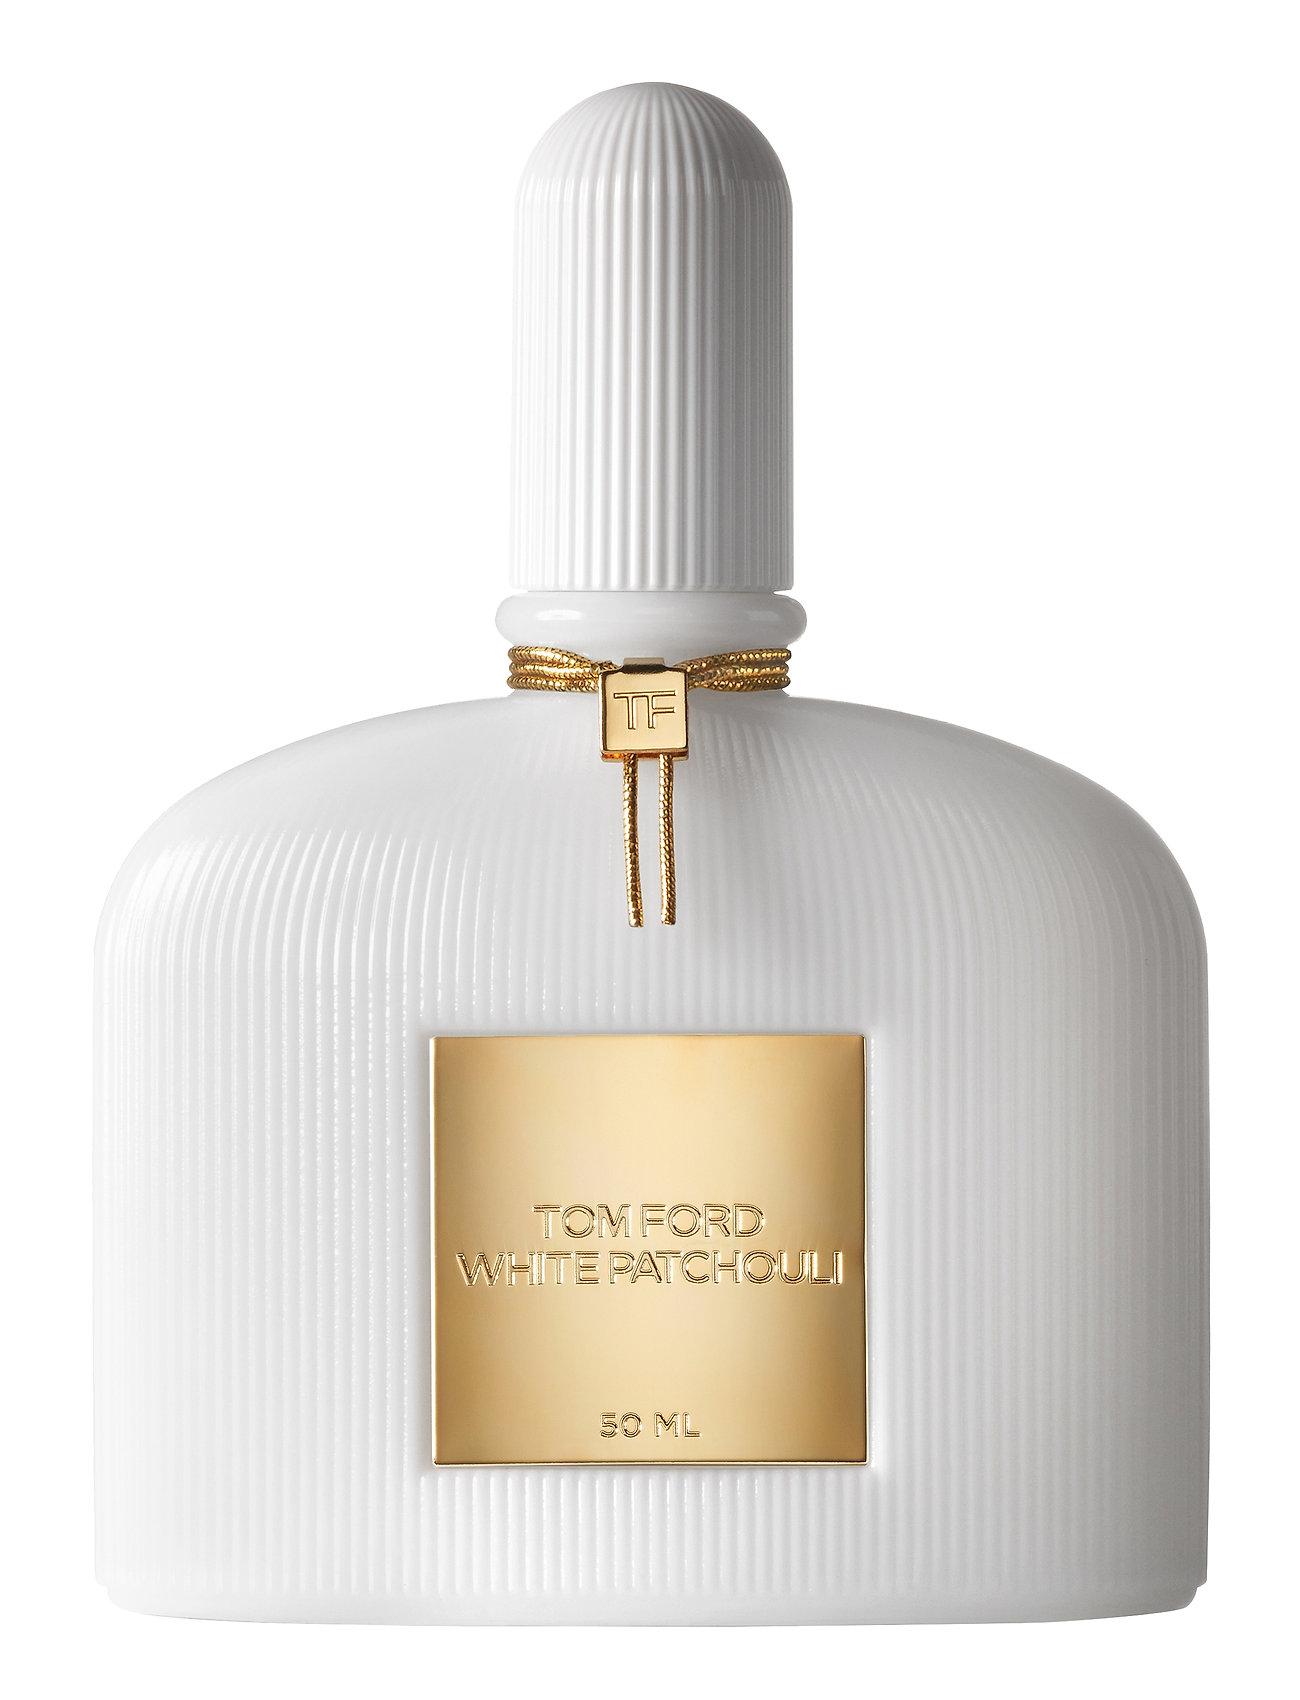 tom ford – White patchouli eau de parfum fra boozt.com dk